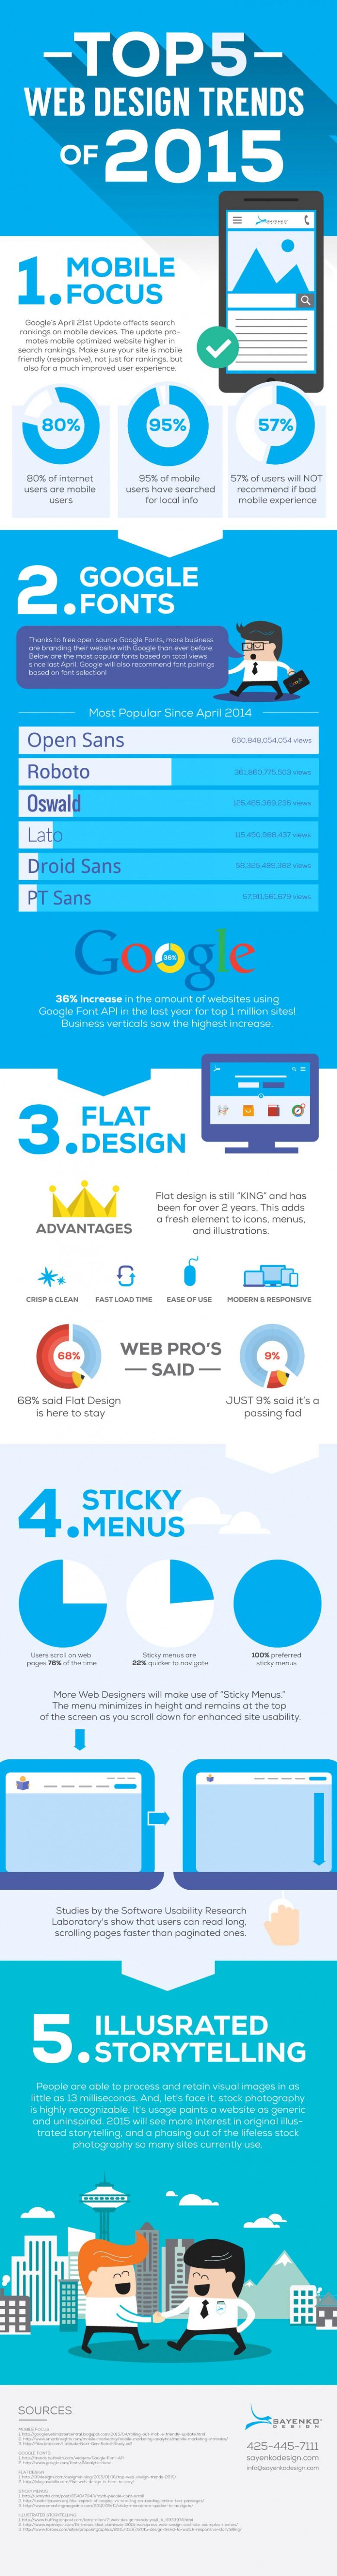 tendances-webdesign-2015